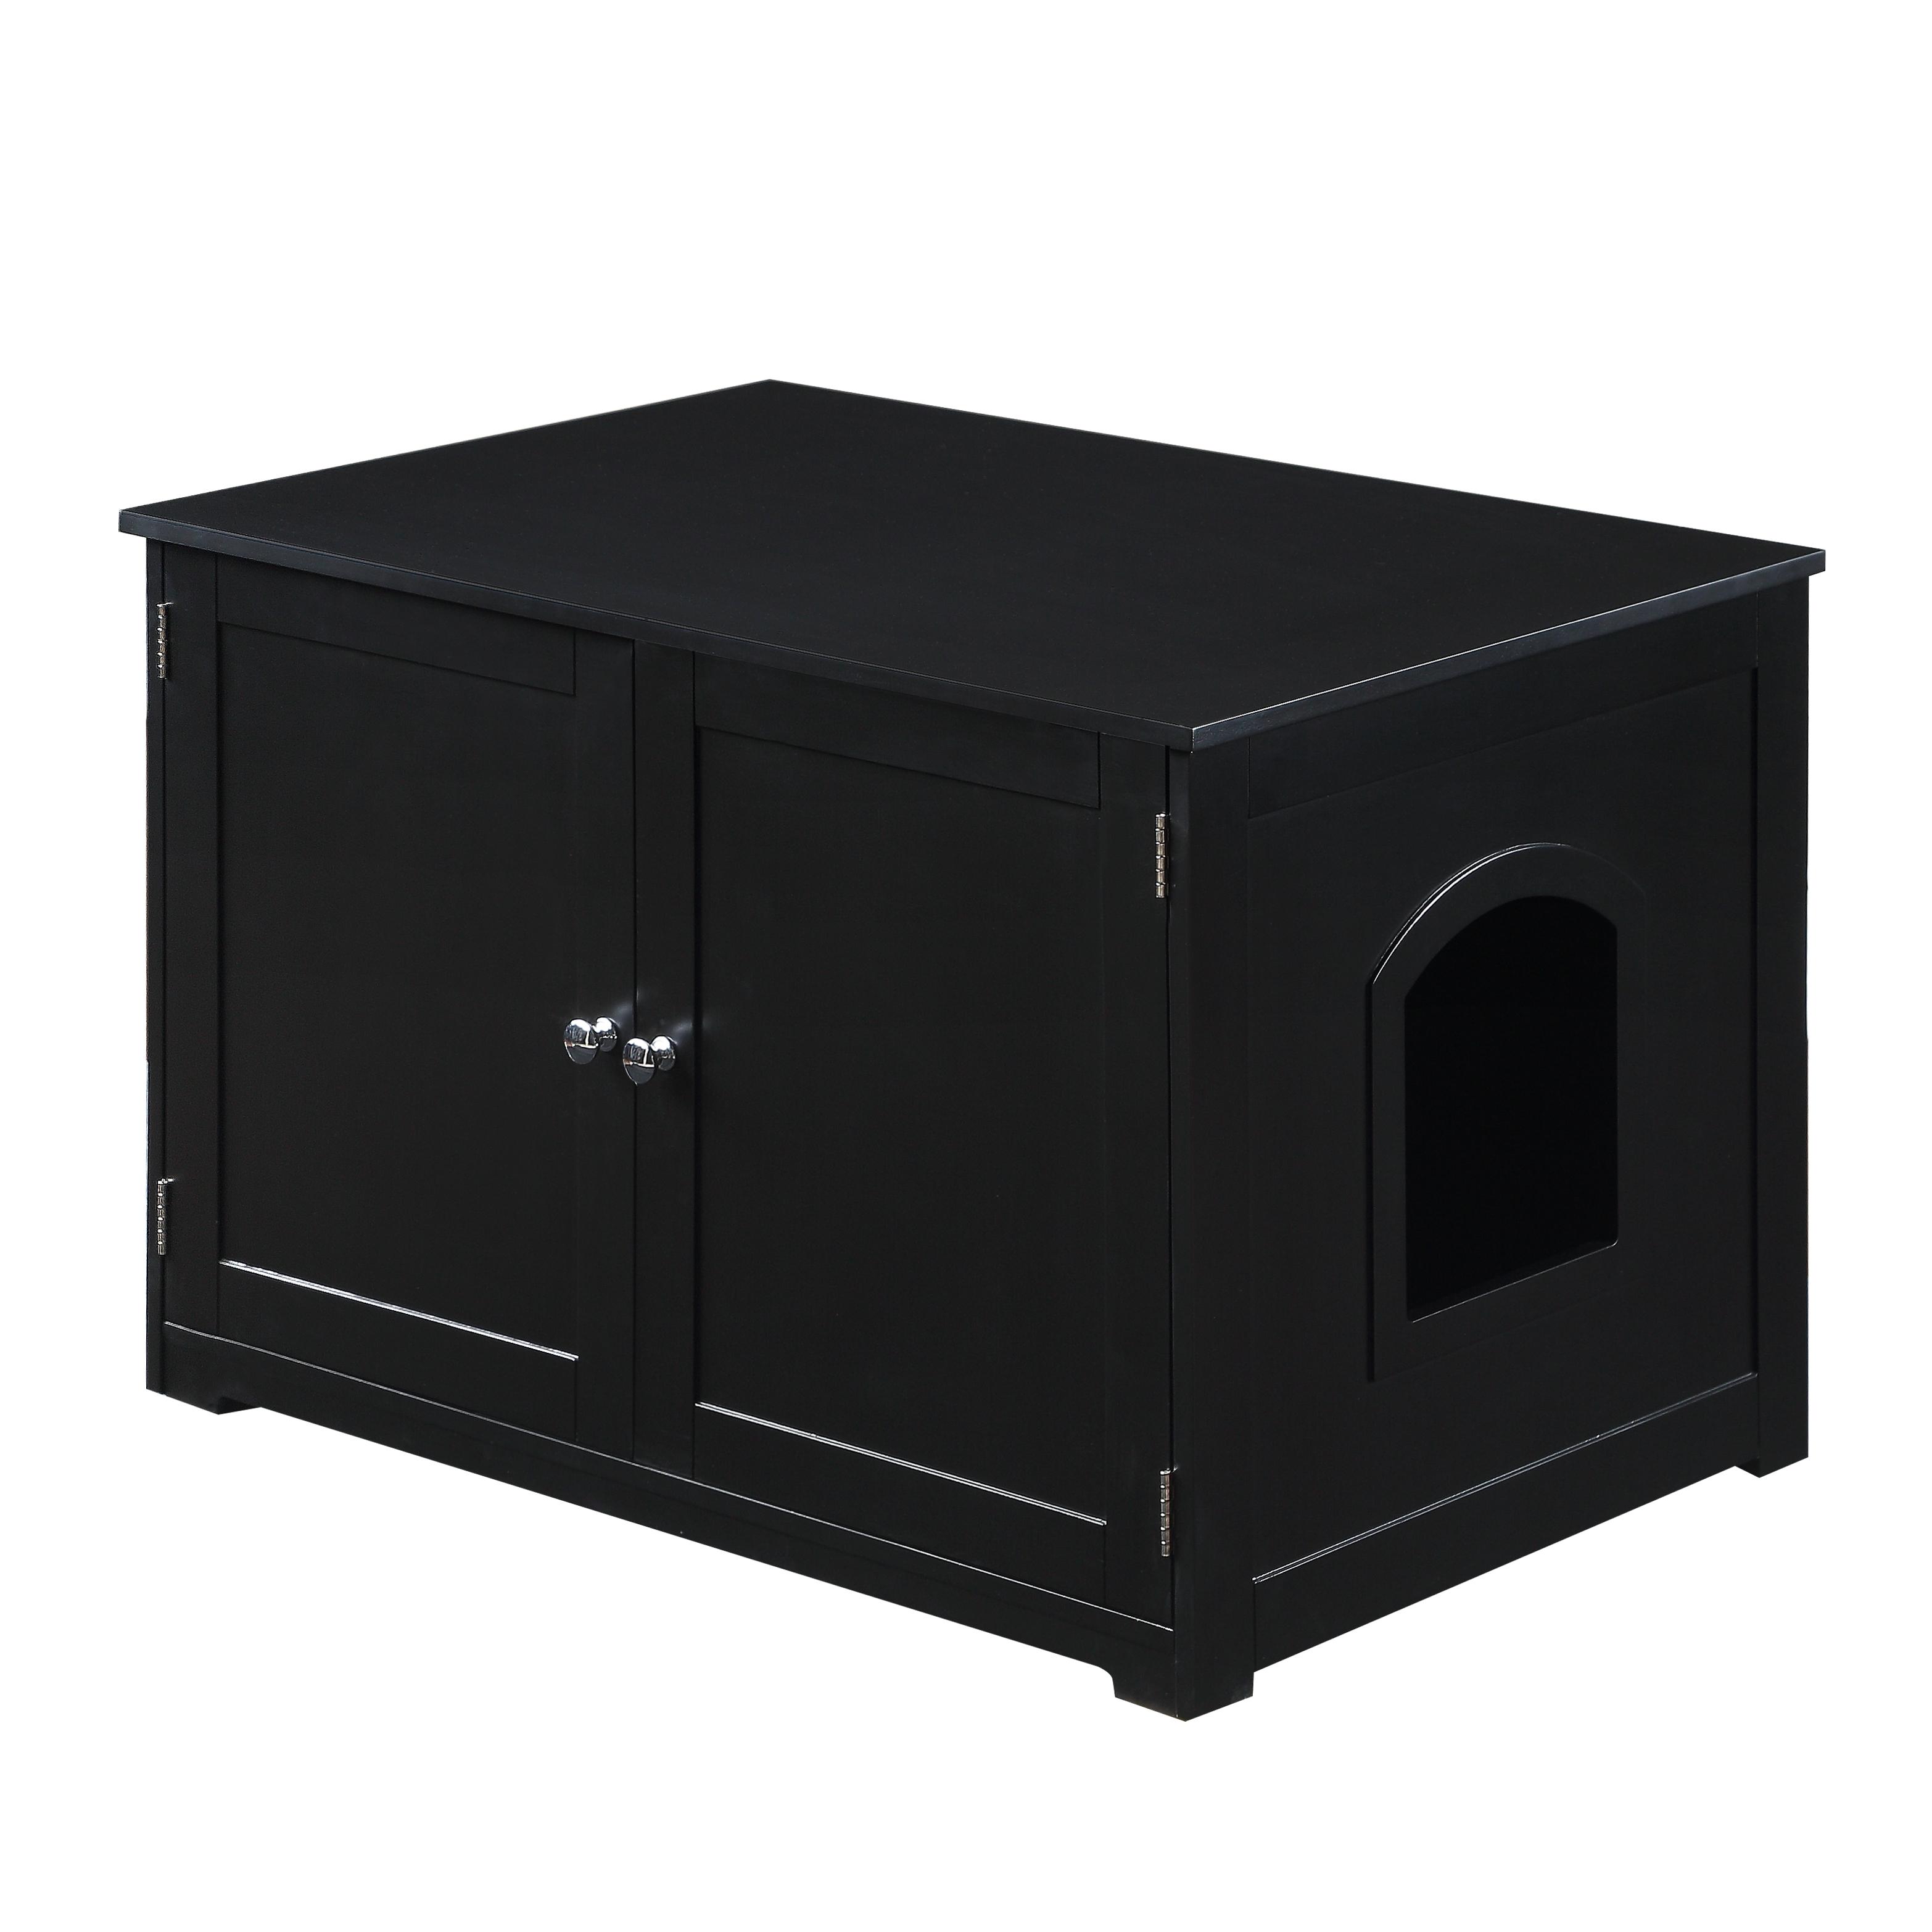 Kitty Litter Loo Bench in Black - Zoovilla PTH1061721700